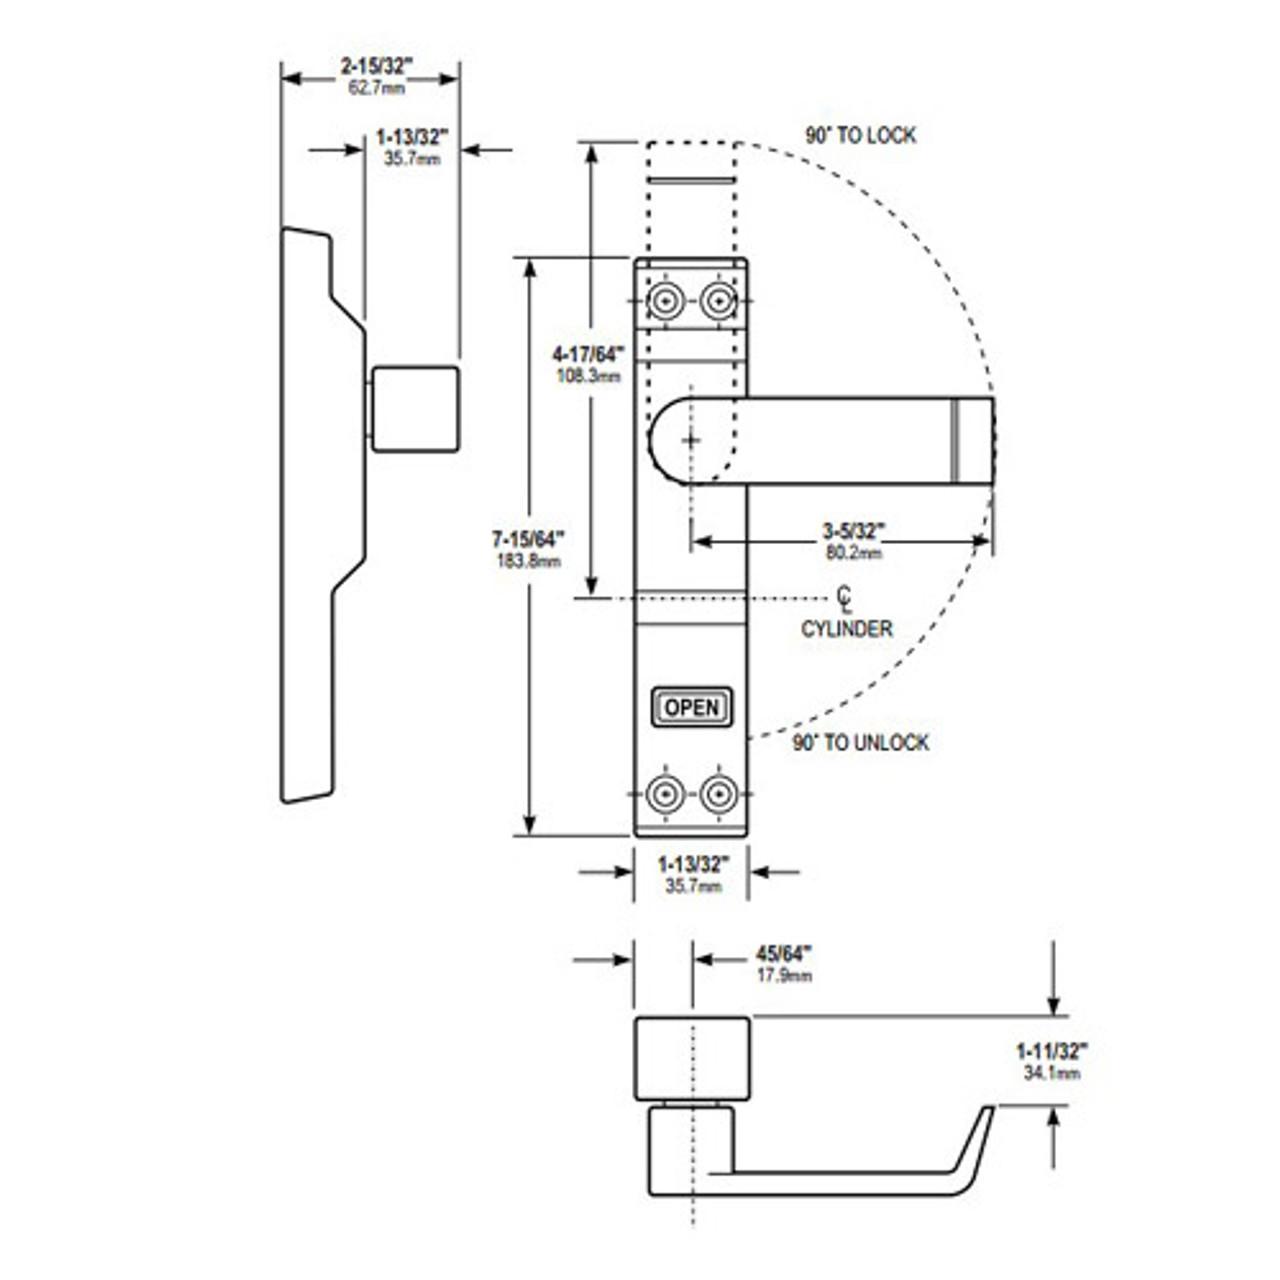 4550R-02-130 Adams Rite MS Deadlock Lever Dimensional View